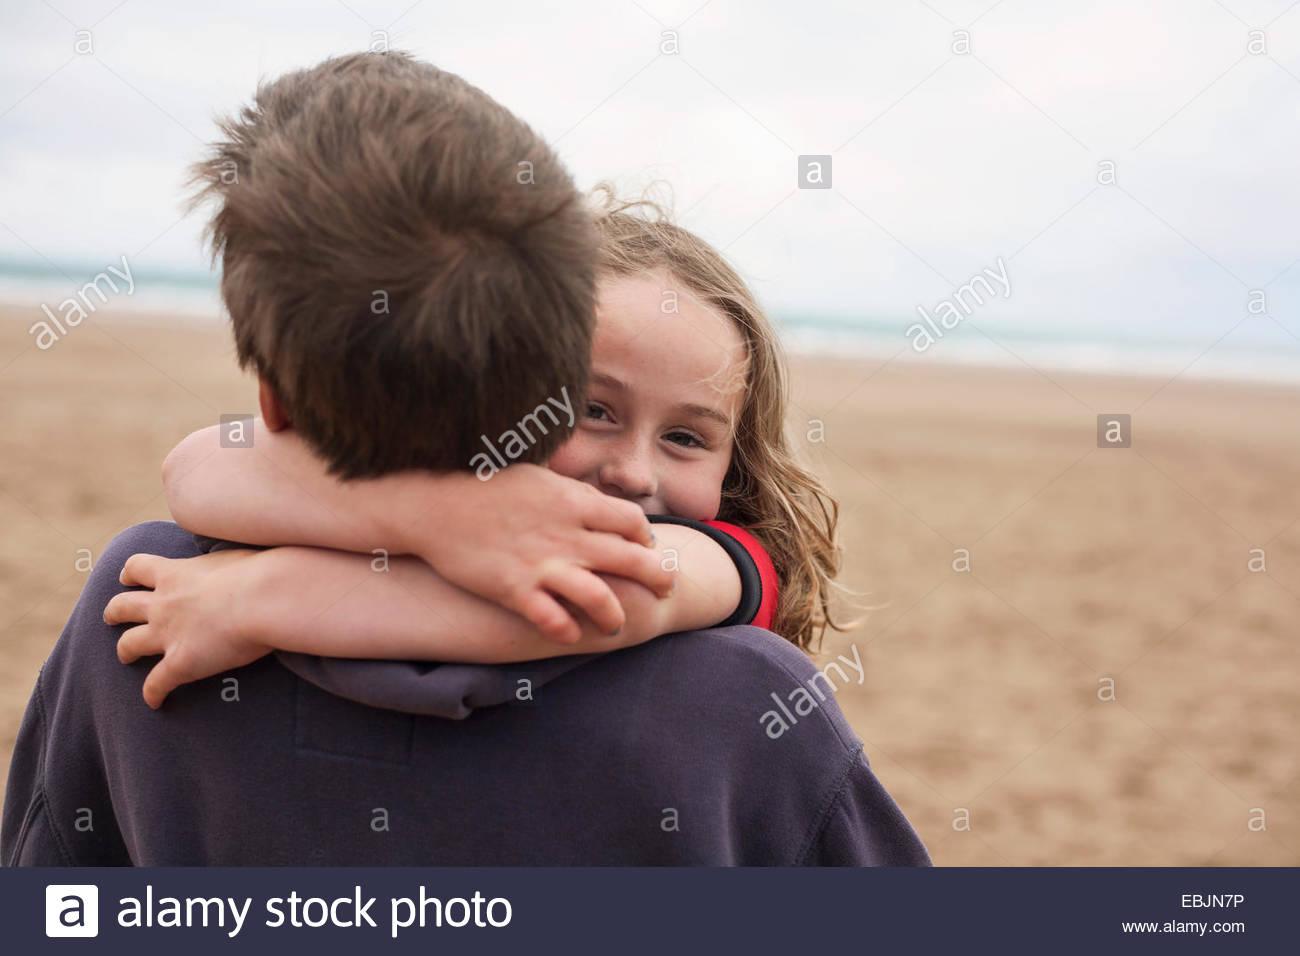 Umarmt junge Mädchen am Strand Stockbild